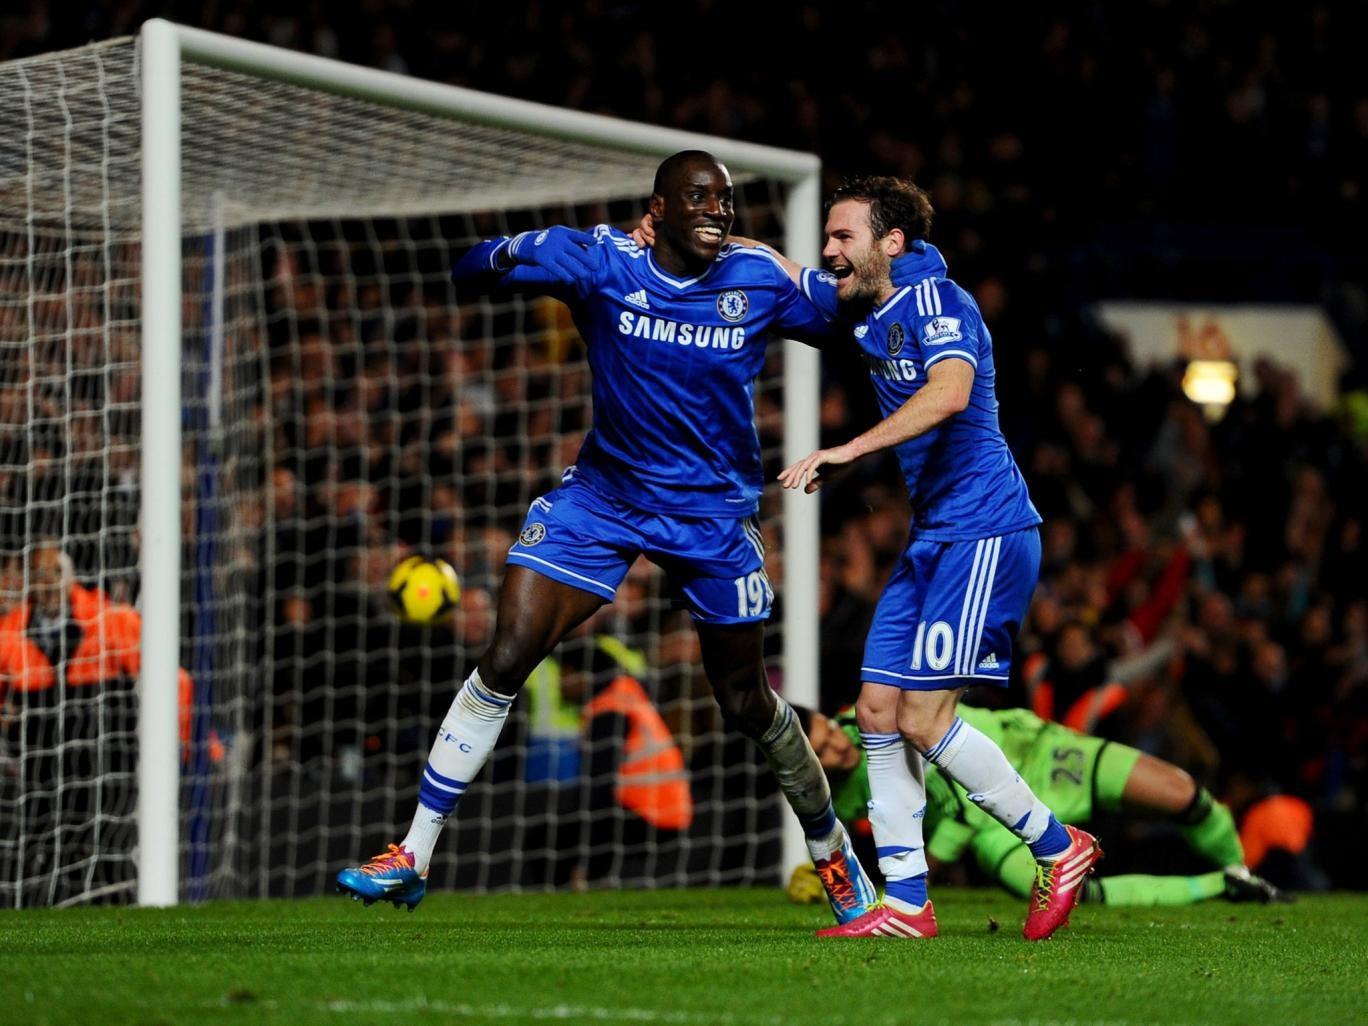 Demba Ba (left) celebrates with team-mate Juan Mata after scoring Chelsea's third goal against Southampton